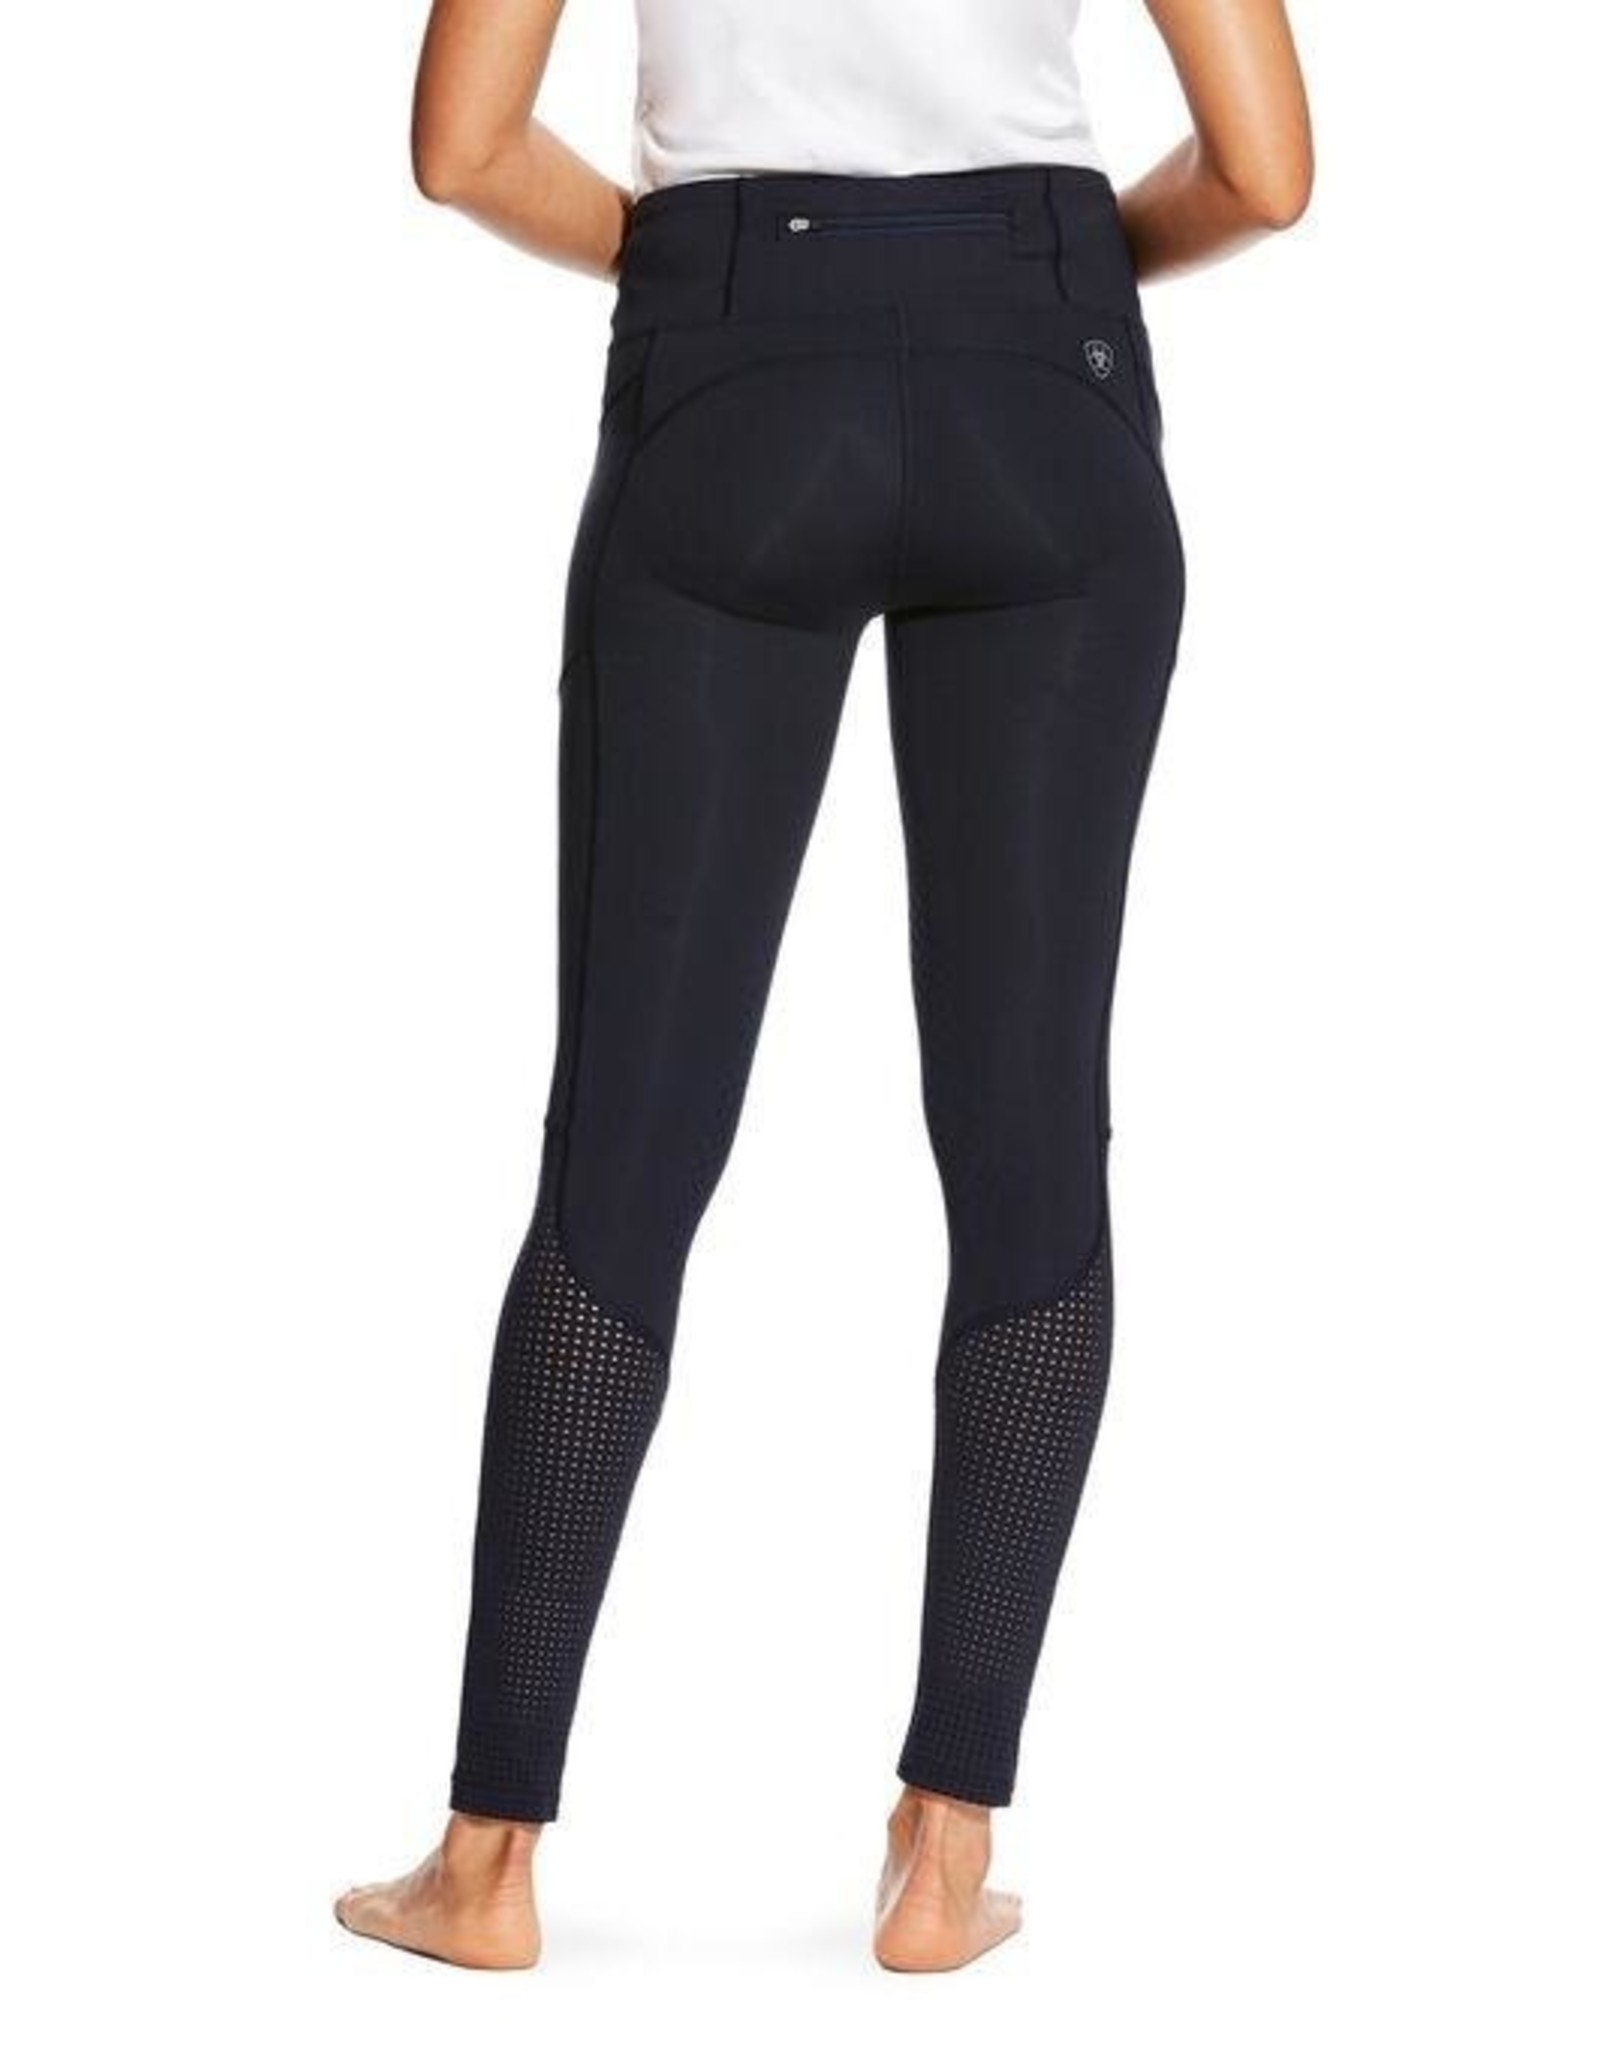 Ariat Eos Ladies' Knee Patch Tights